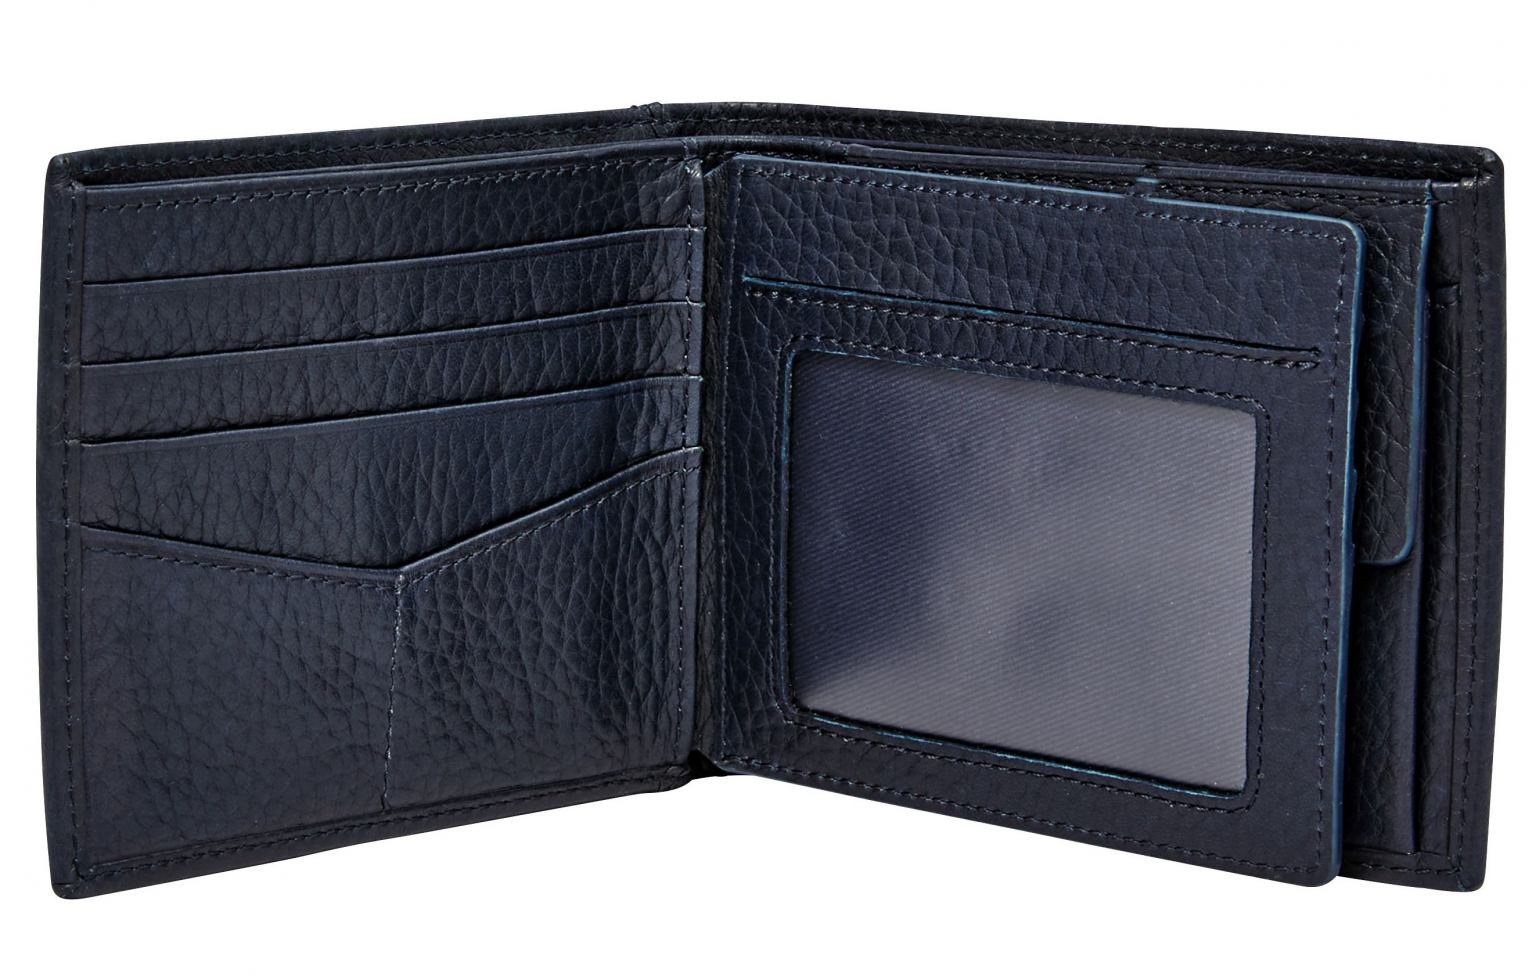 Fossil Mayfair Large RFID Protection Geldbörse Navy Blau